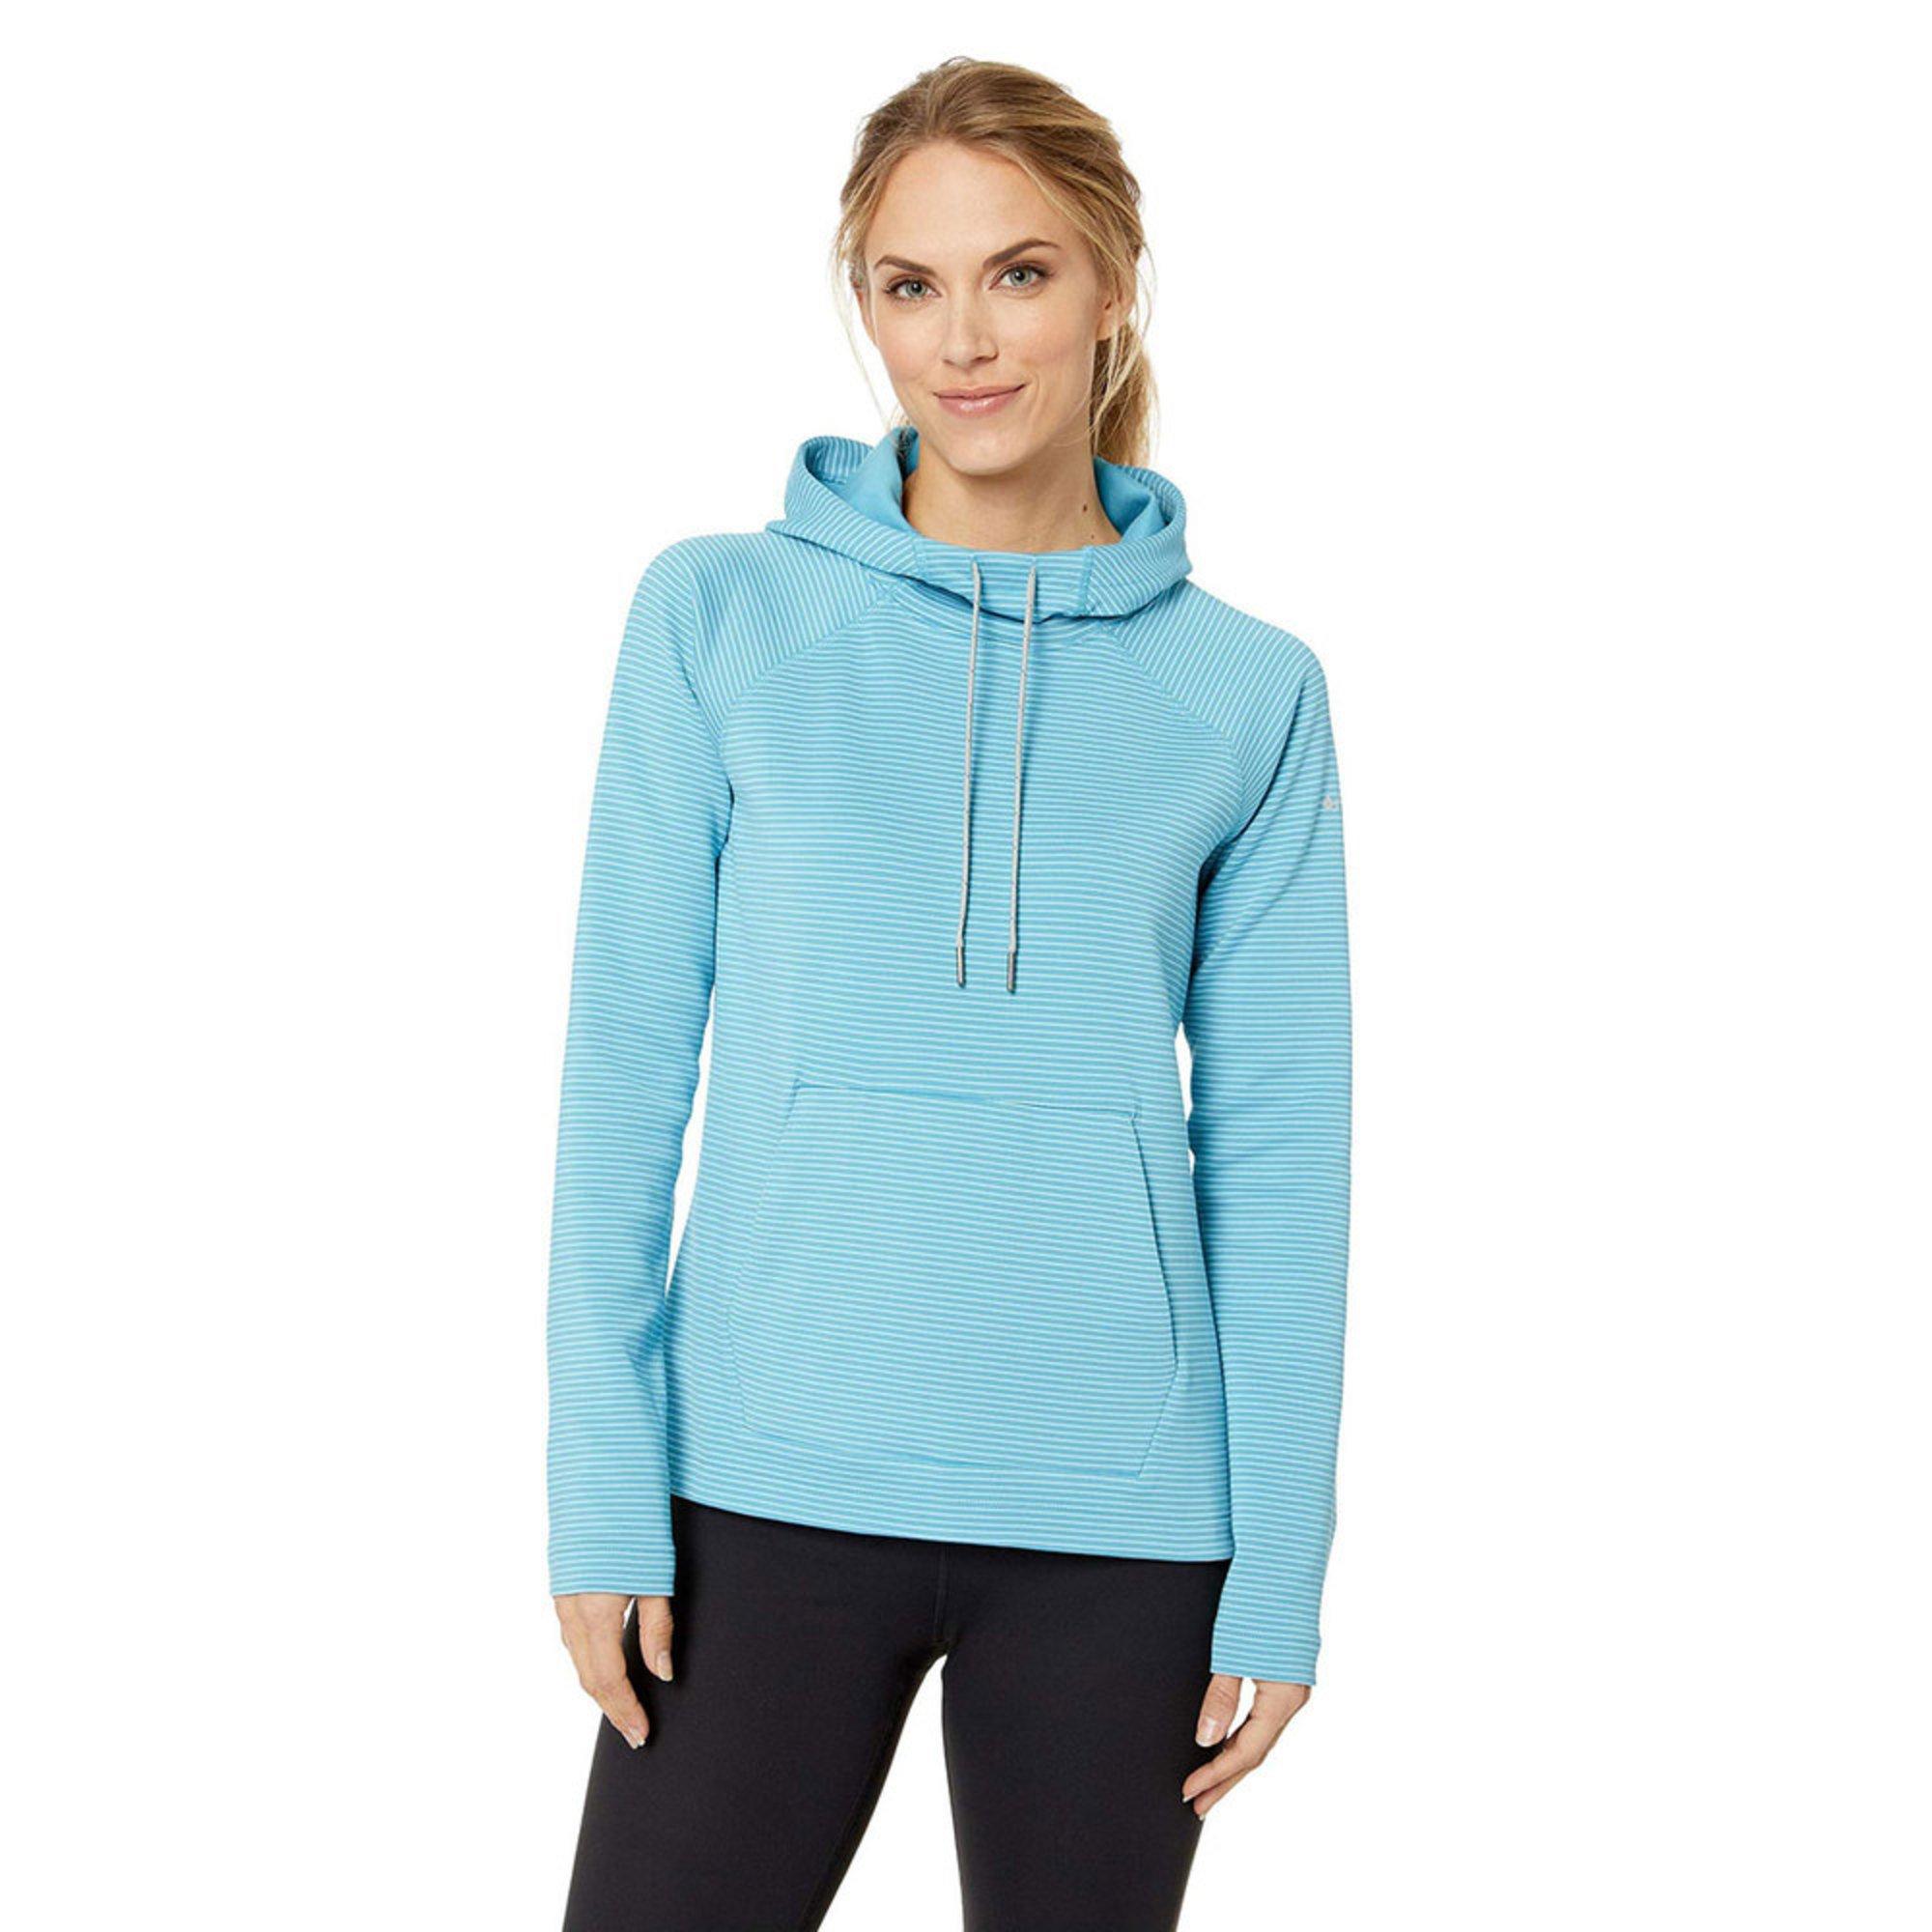 68b0795c Columbia Women's Bryce Canyon Hoodie | Outdoor Hoodies & Fleece ...